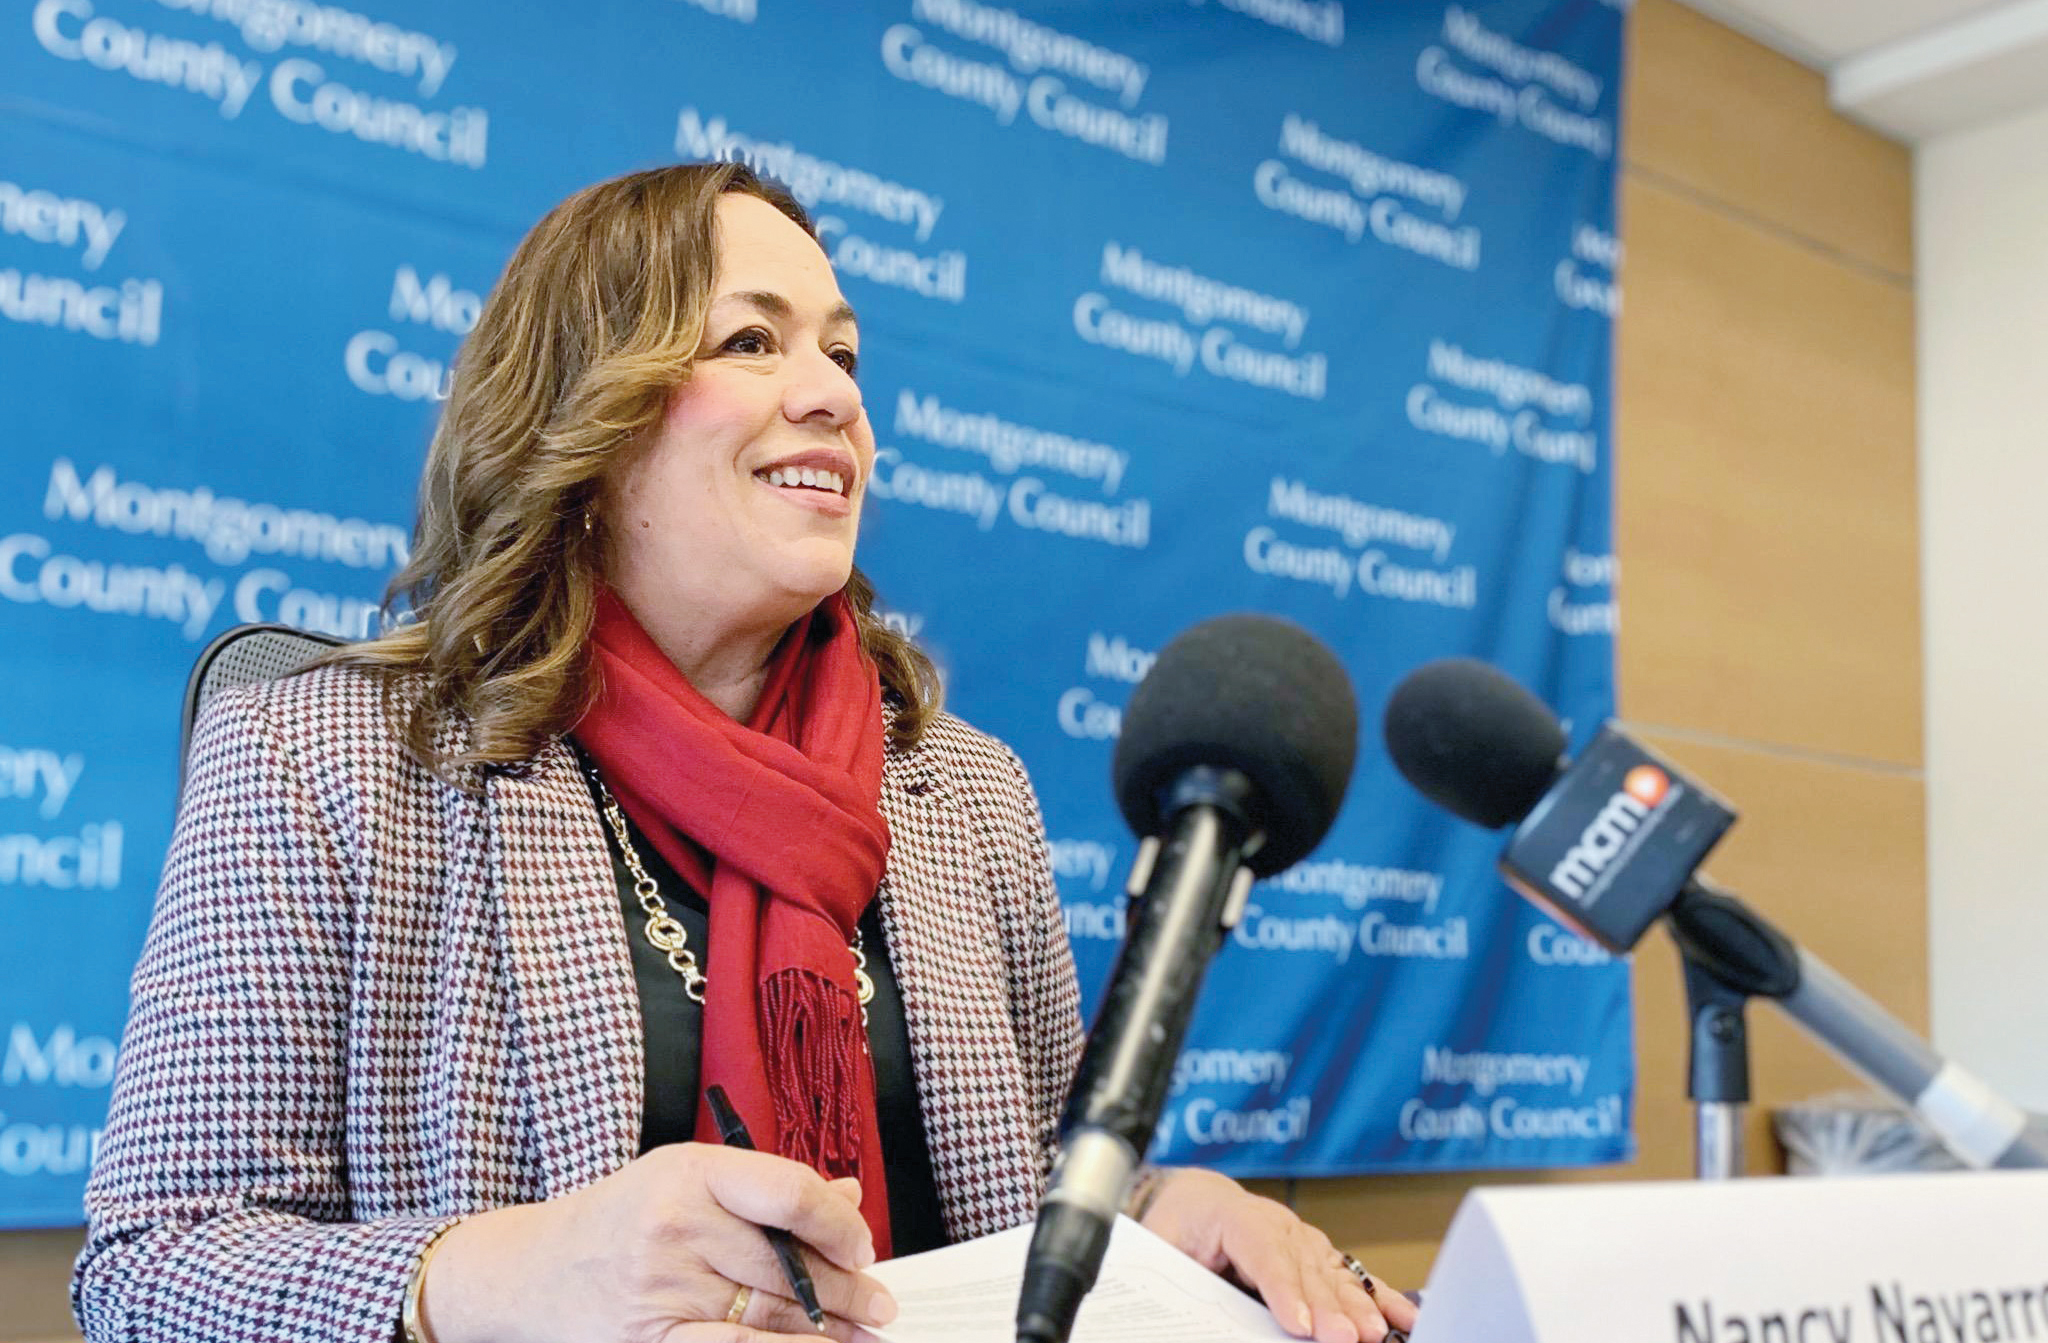 Nancy Navarro culmina periodo como presidenta